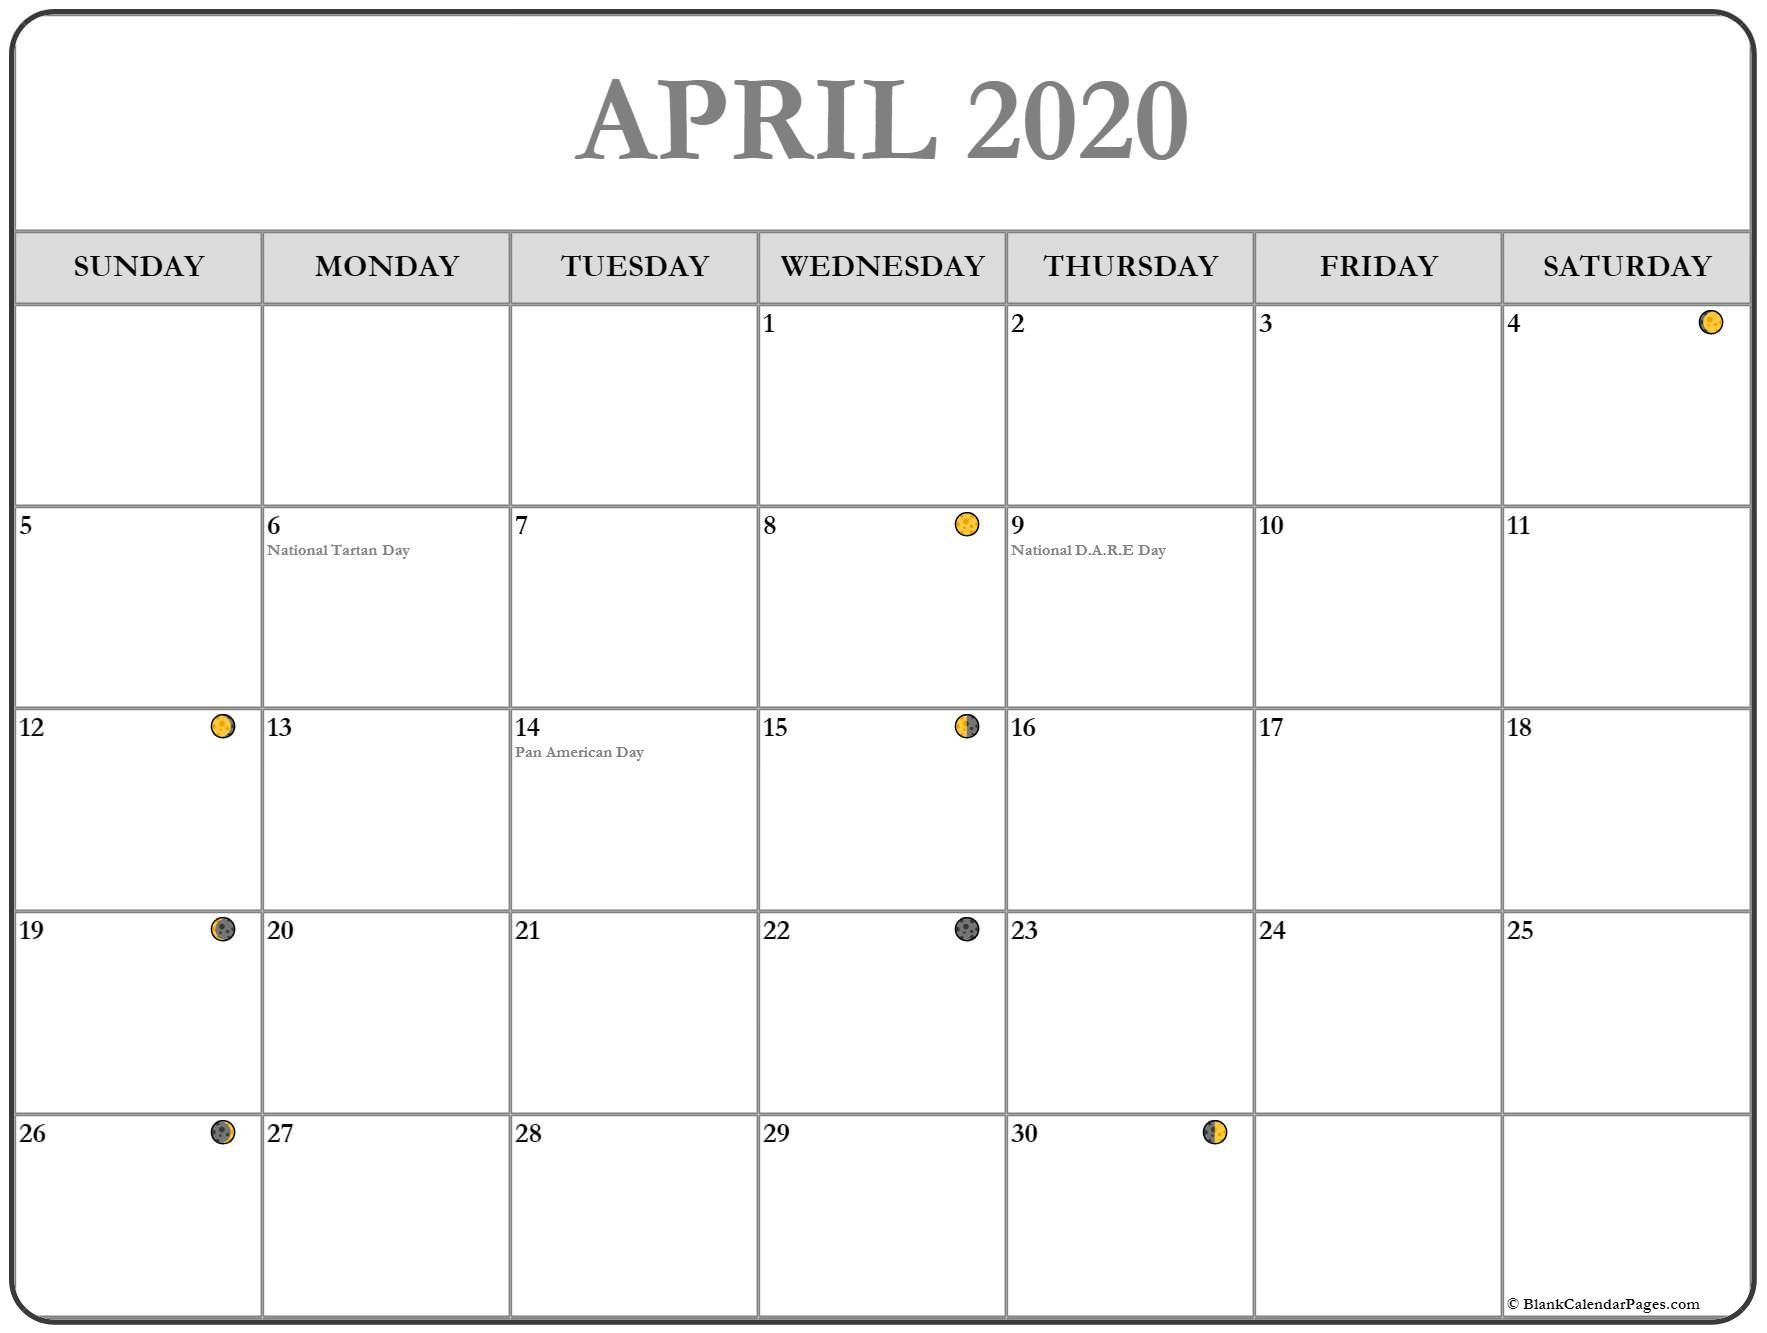 Moon Calendar Template April 2020 | Moon Calendar, Moon